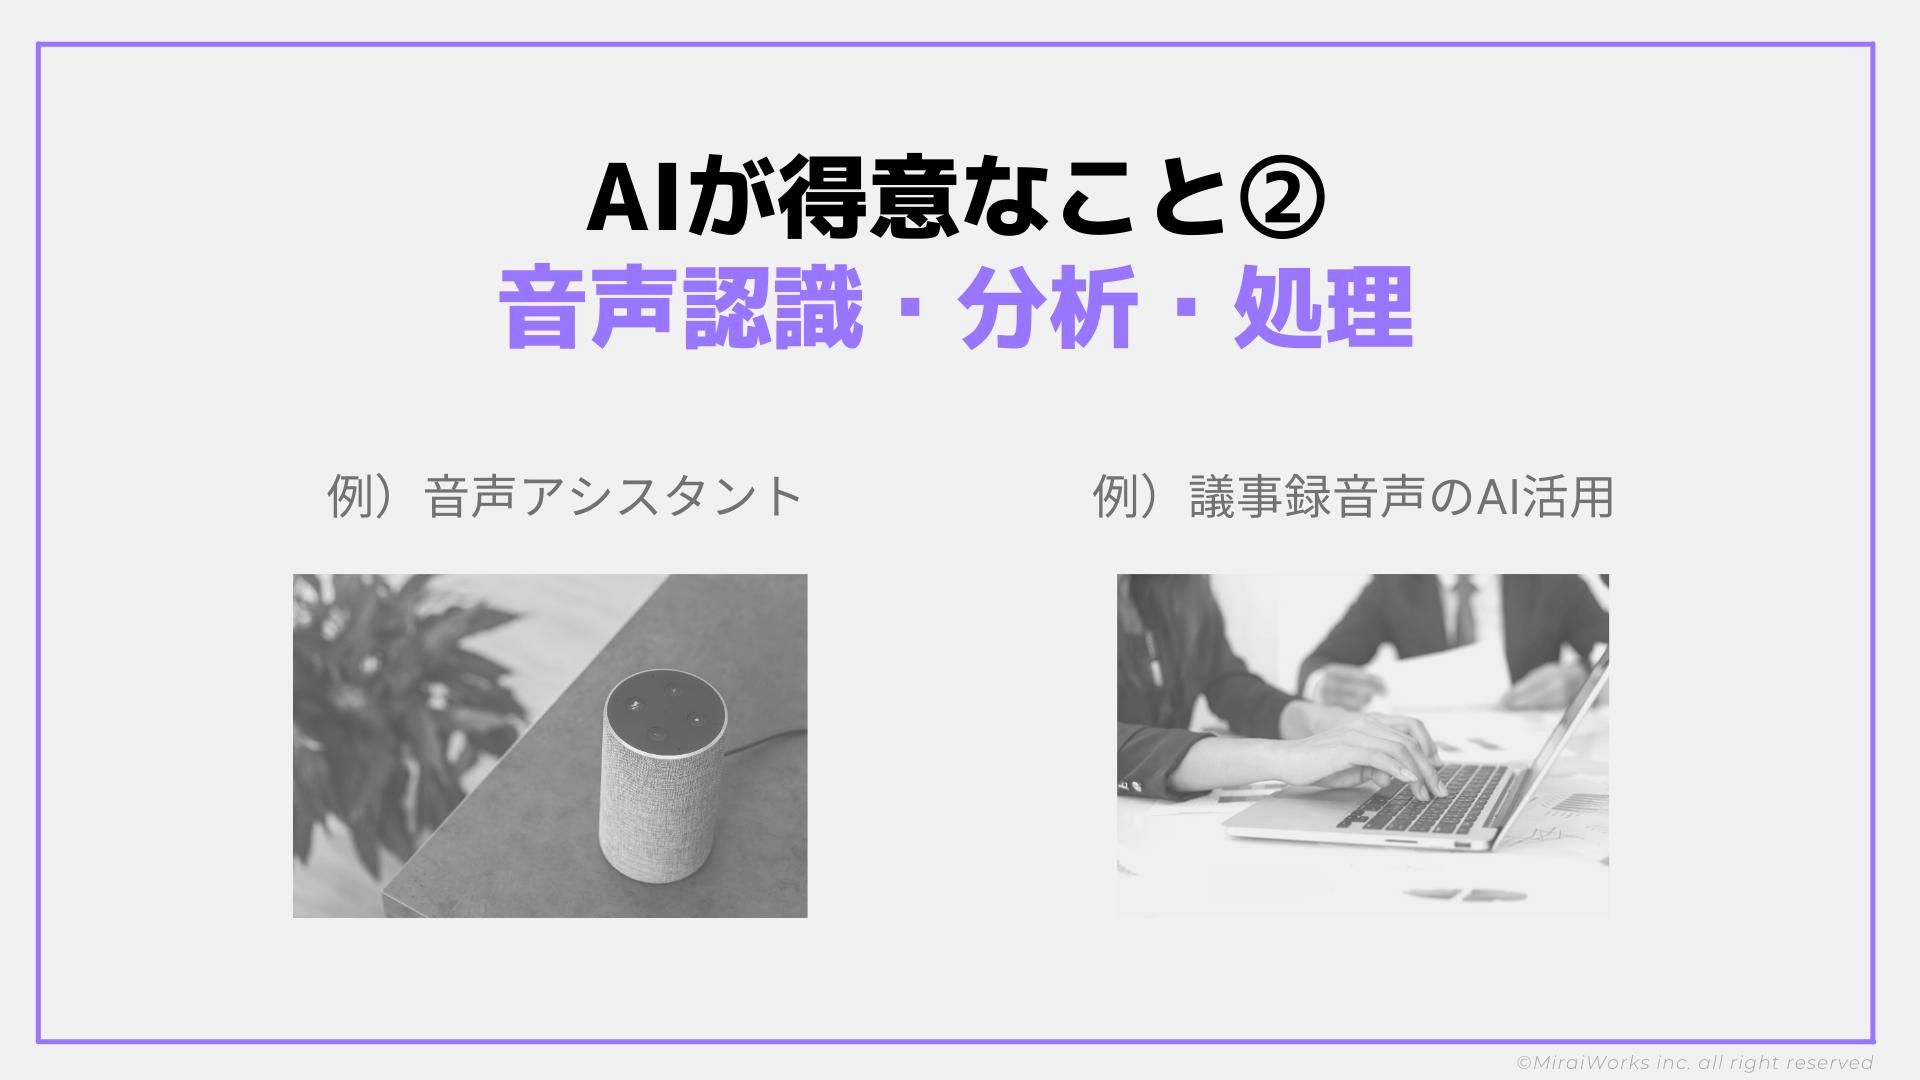 AIが得意なこと2_音声認識_分析_処理